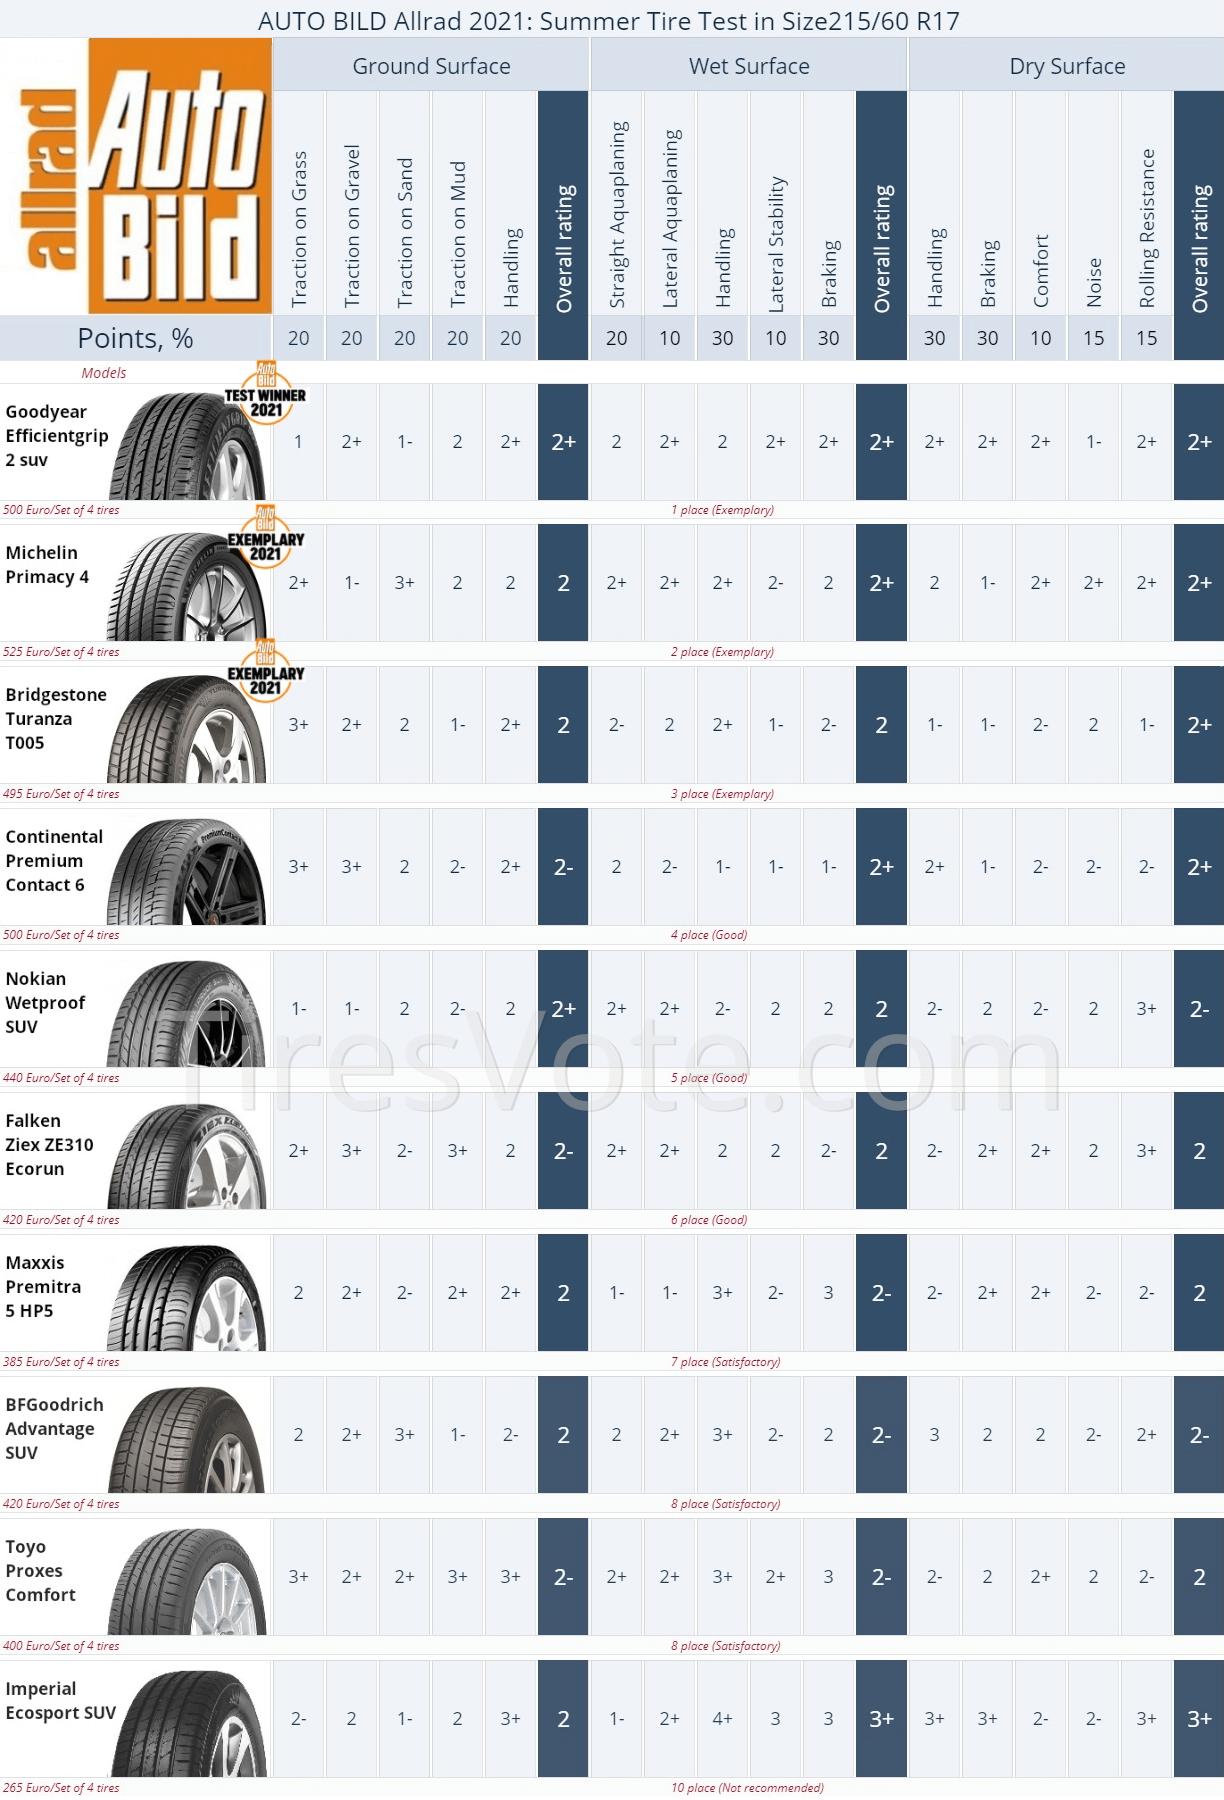 225/60R17 Summer Tire Test Results, Auto Bild Allrad 2021